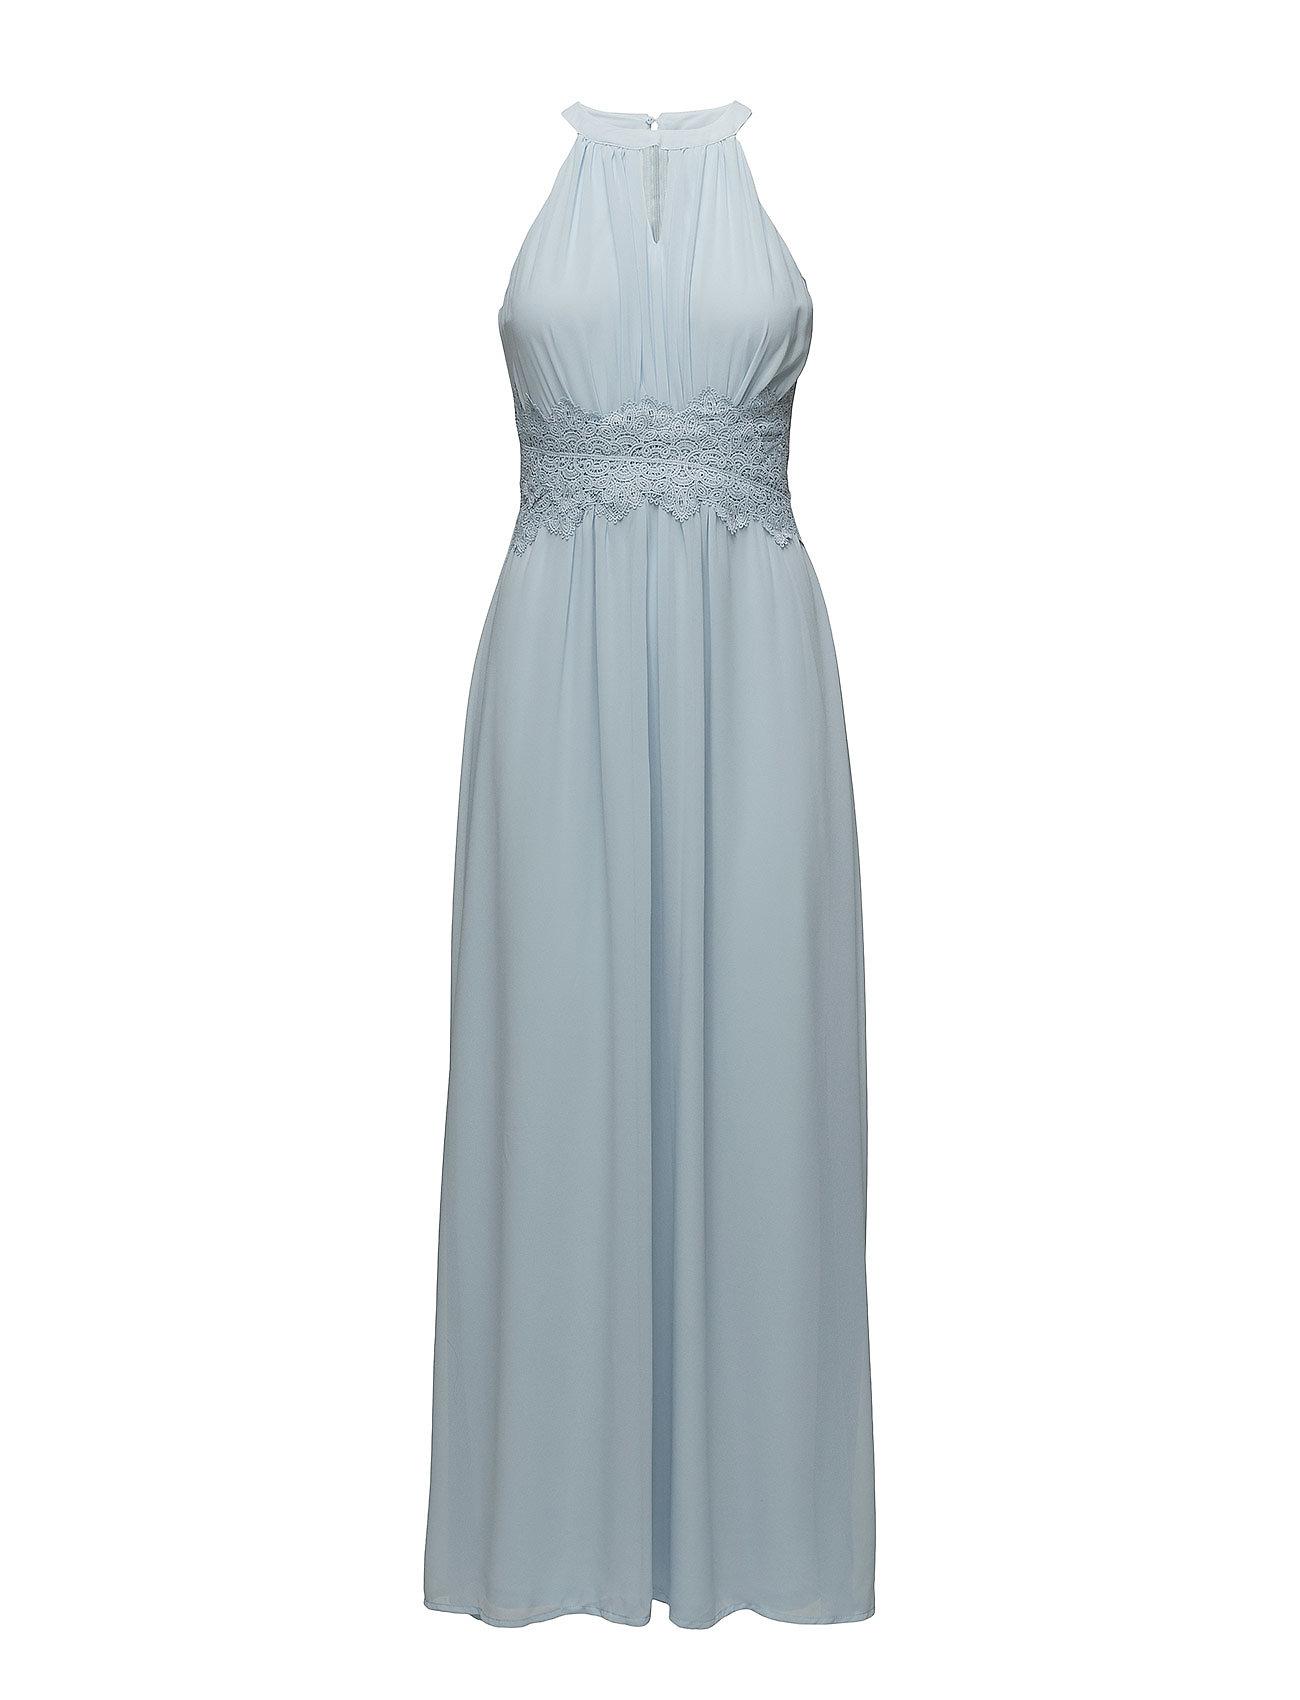 Vimilina Halterneck Maxi Dress/dc/2 (Celestial Blue) (£36) - Dresses ...